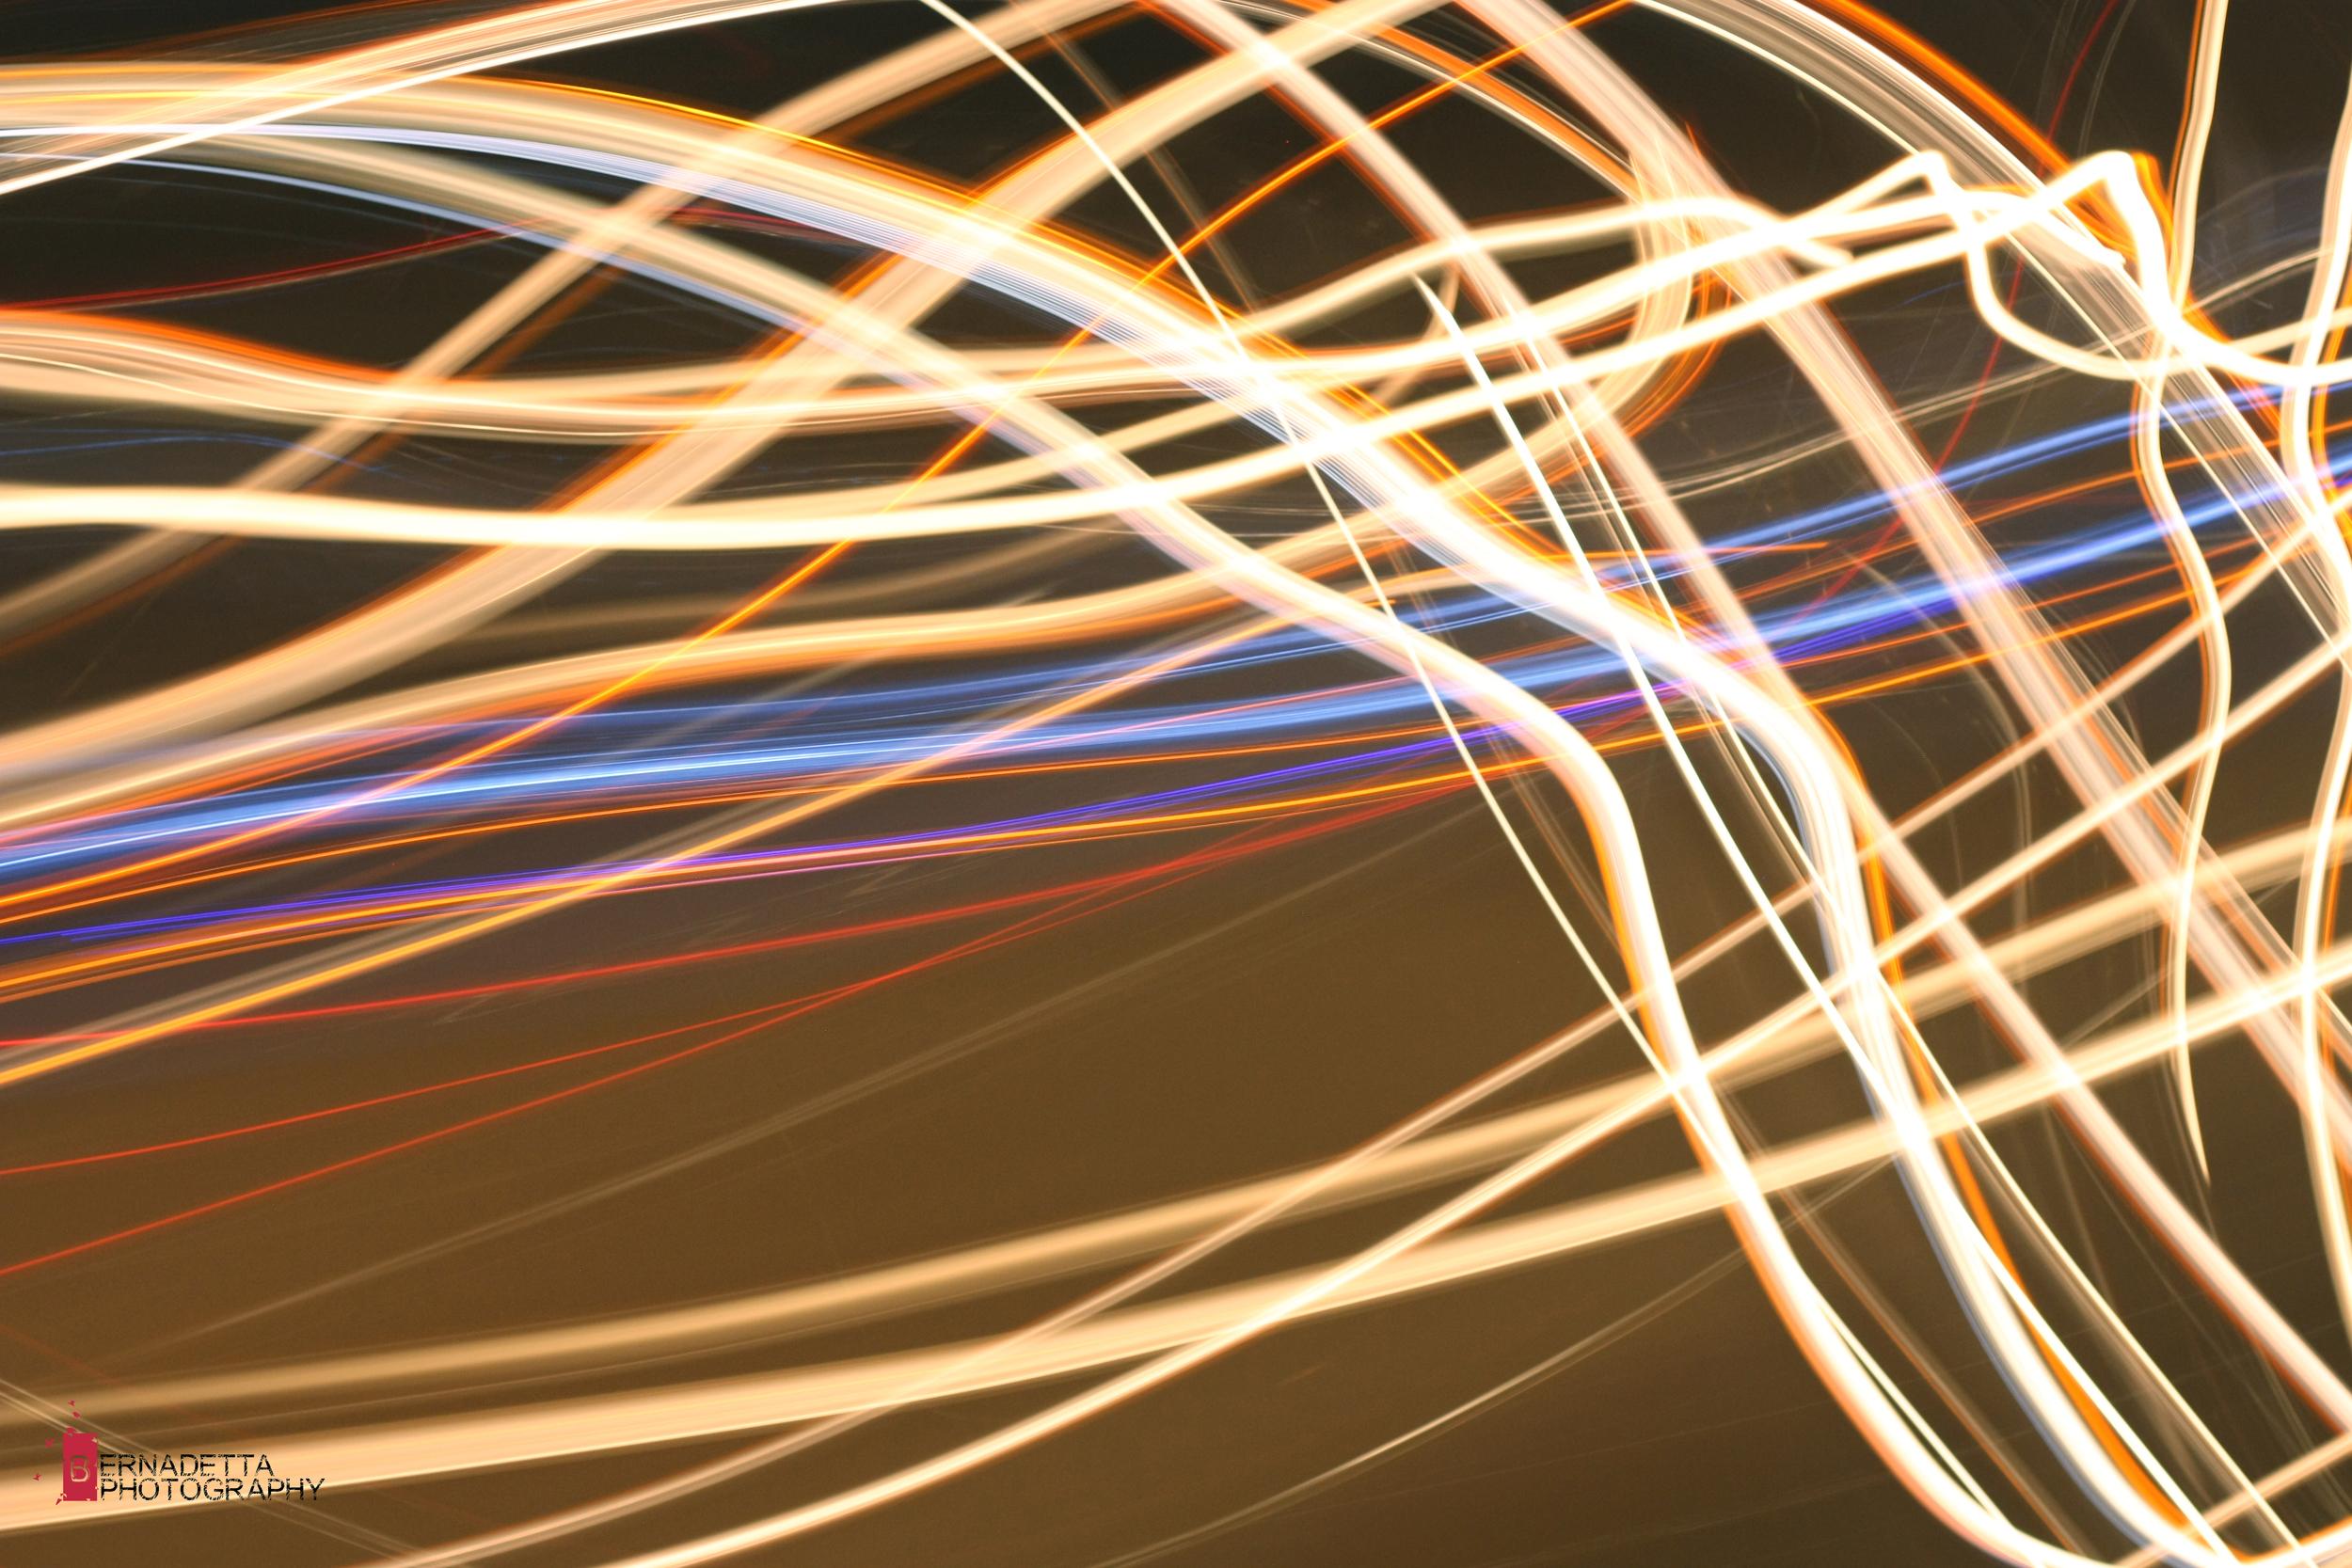 Abstract2.jpg